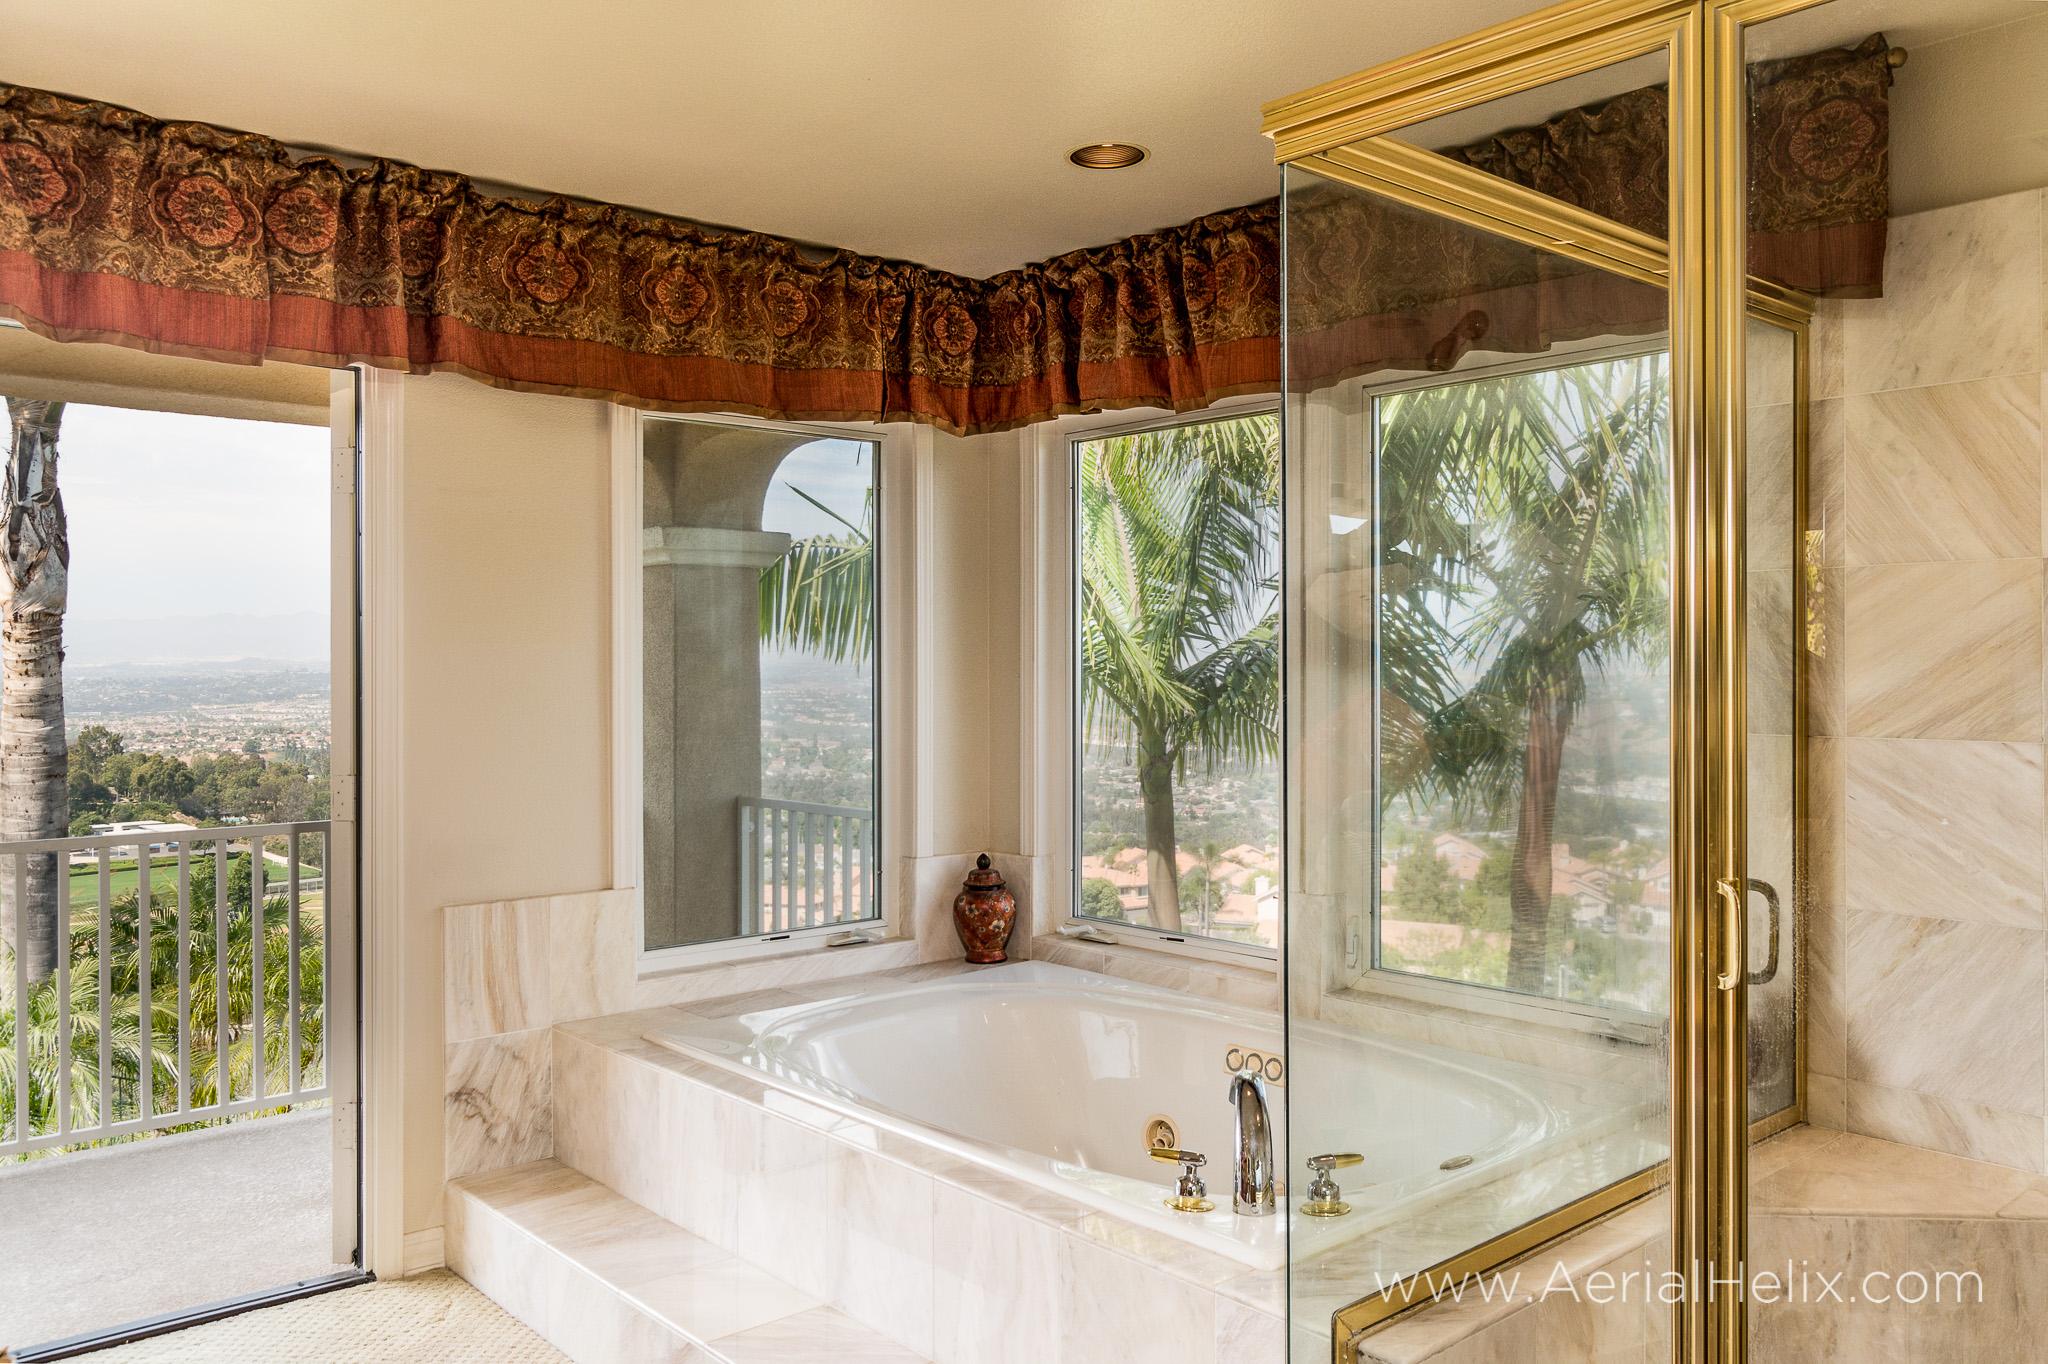 HELIX - Vista Montemar - real-estate-photographer-38.jpg